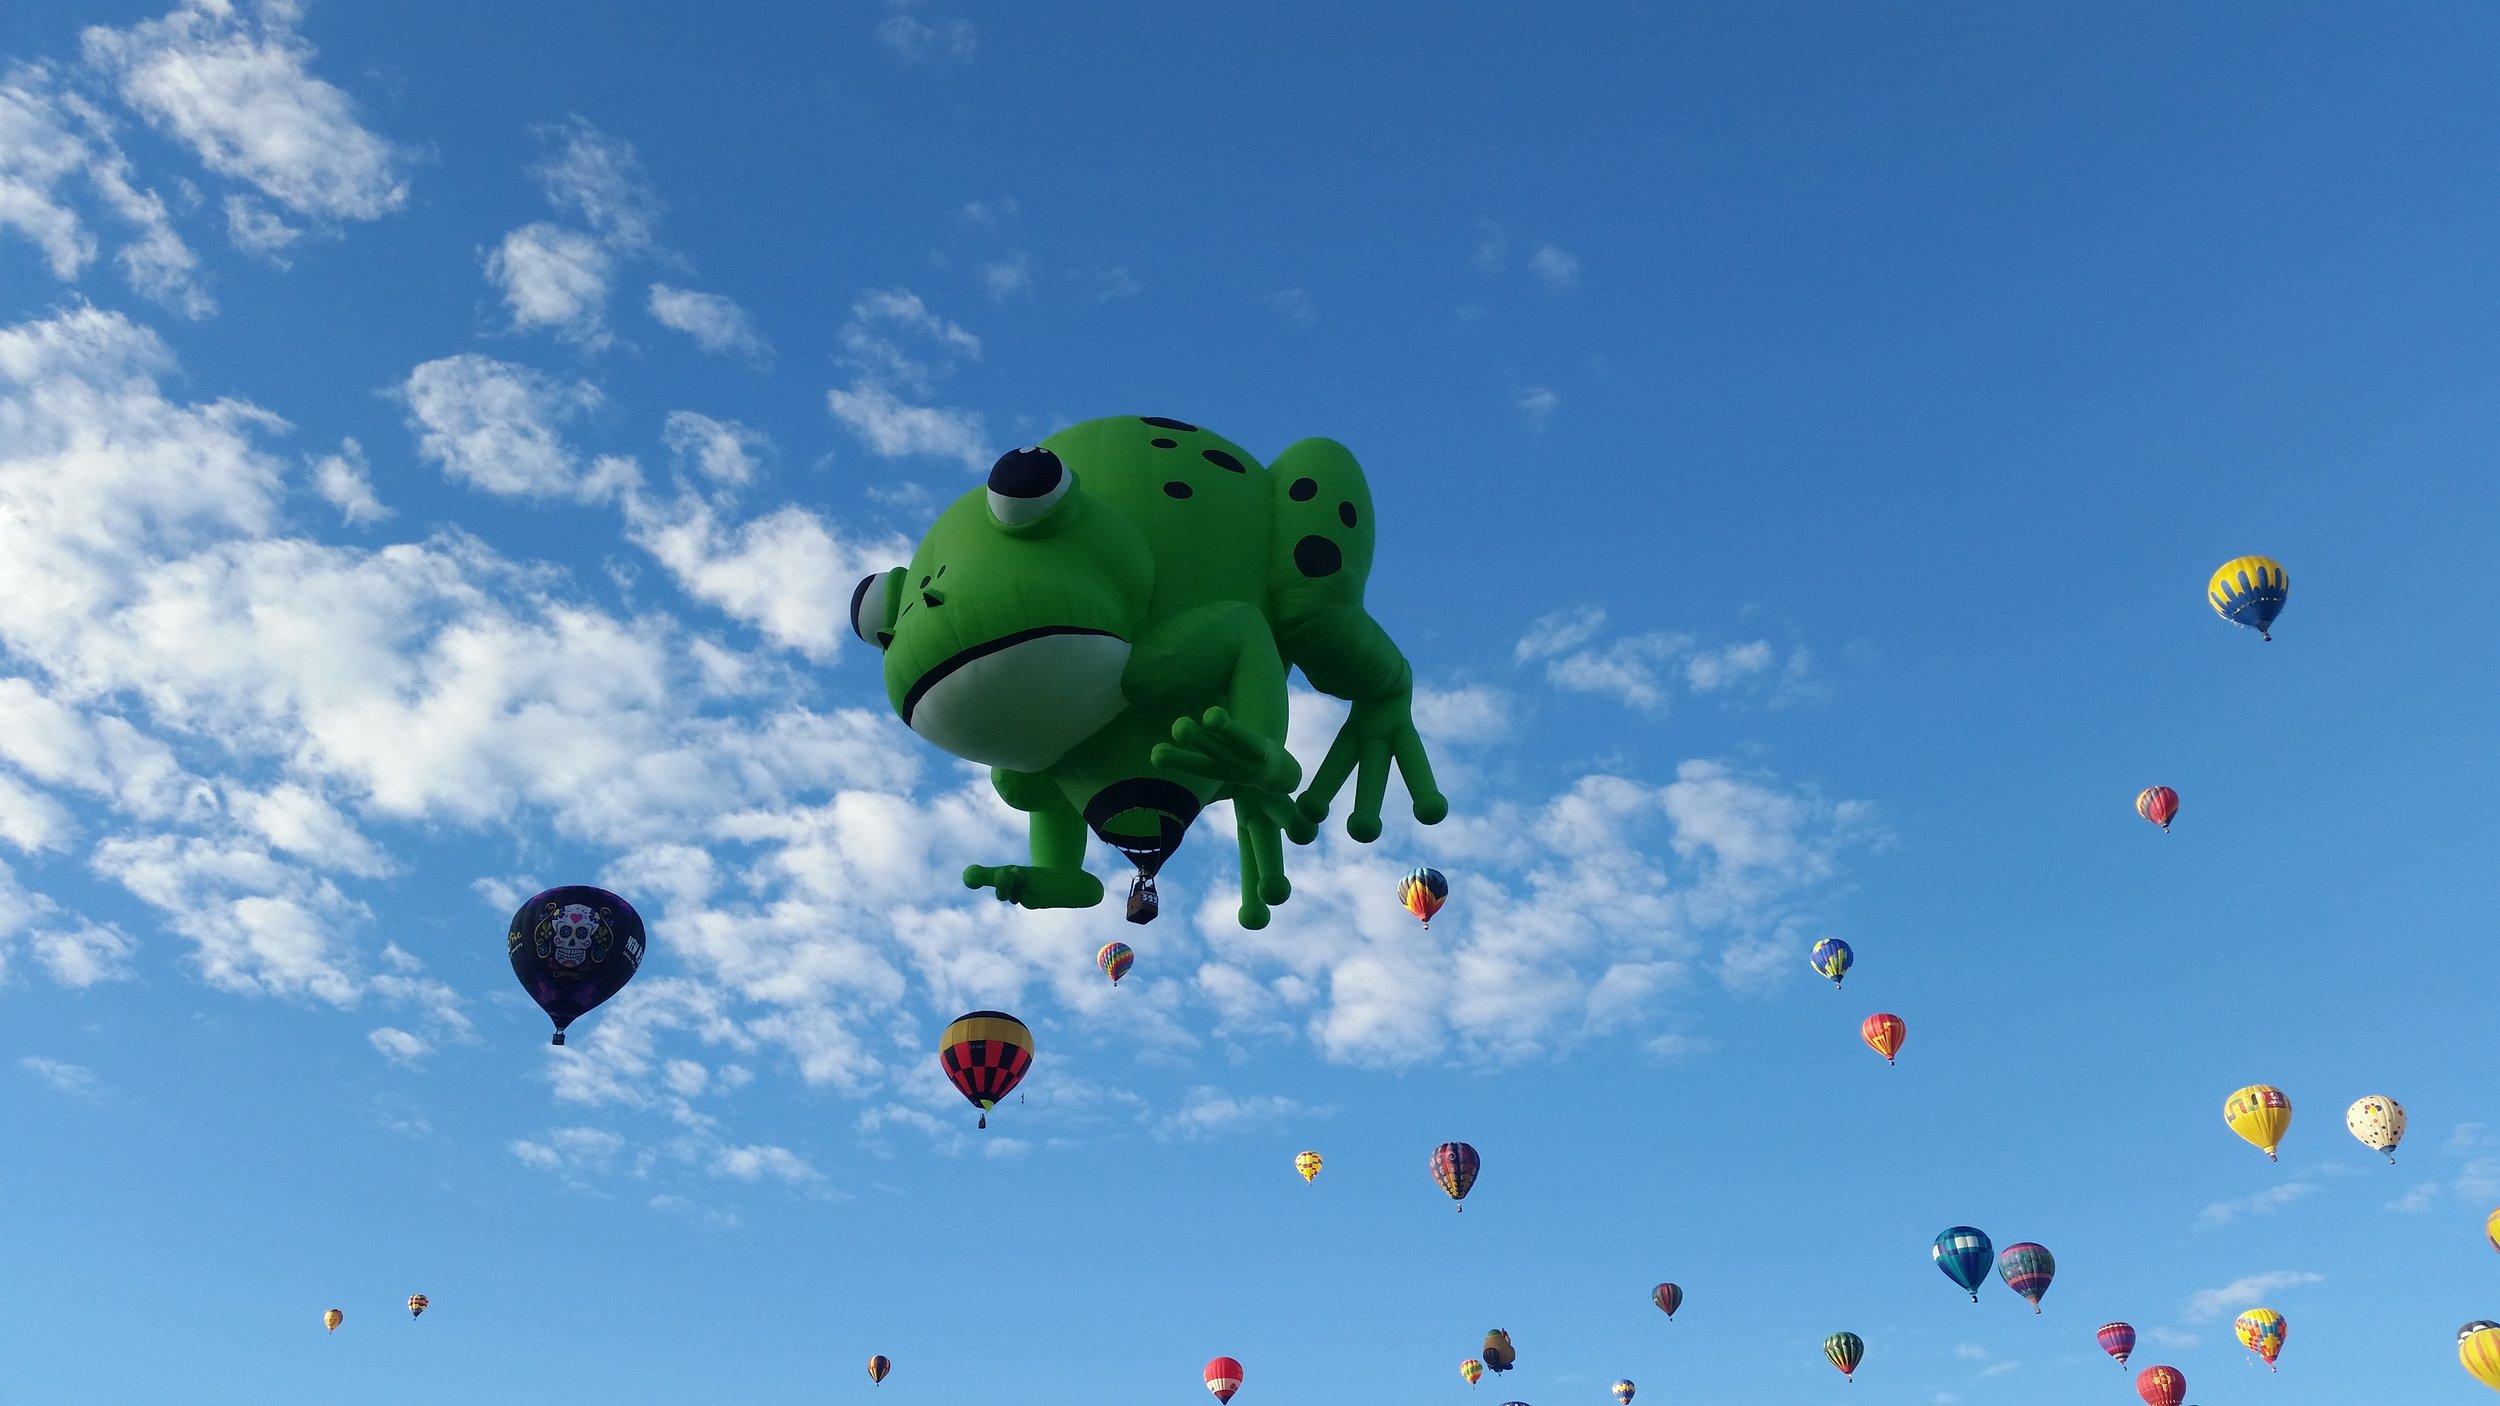 frogballoon.jpg